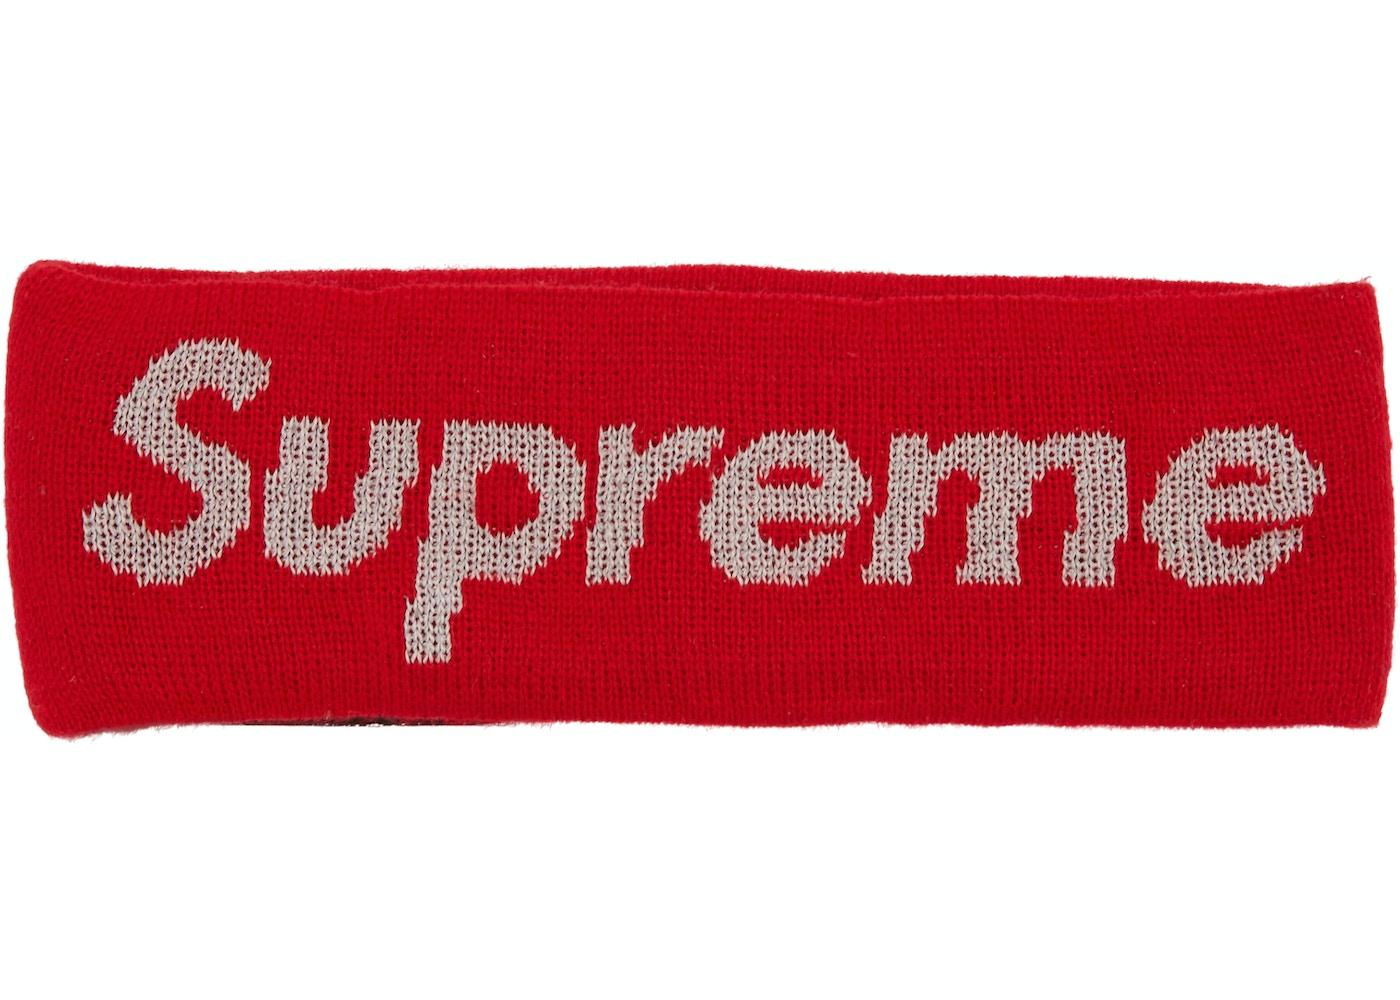 on sale c6f97 863dd Supreme New Era Reflective Logo Headband (FW 17) Red — HypeAnalyzer